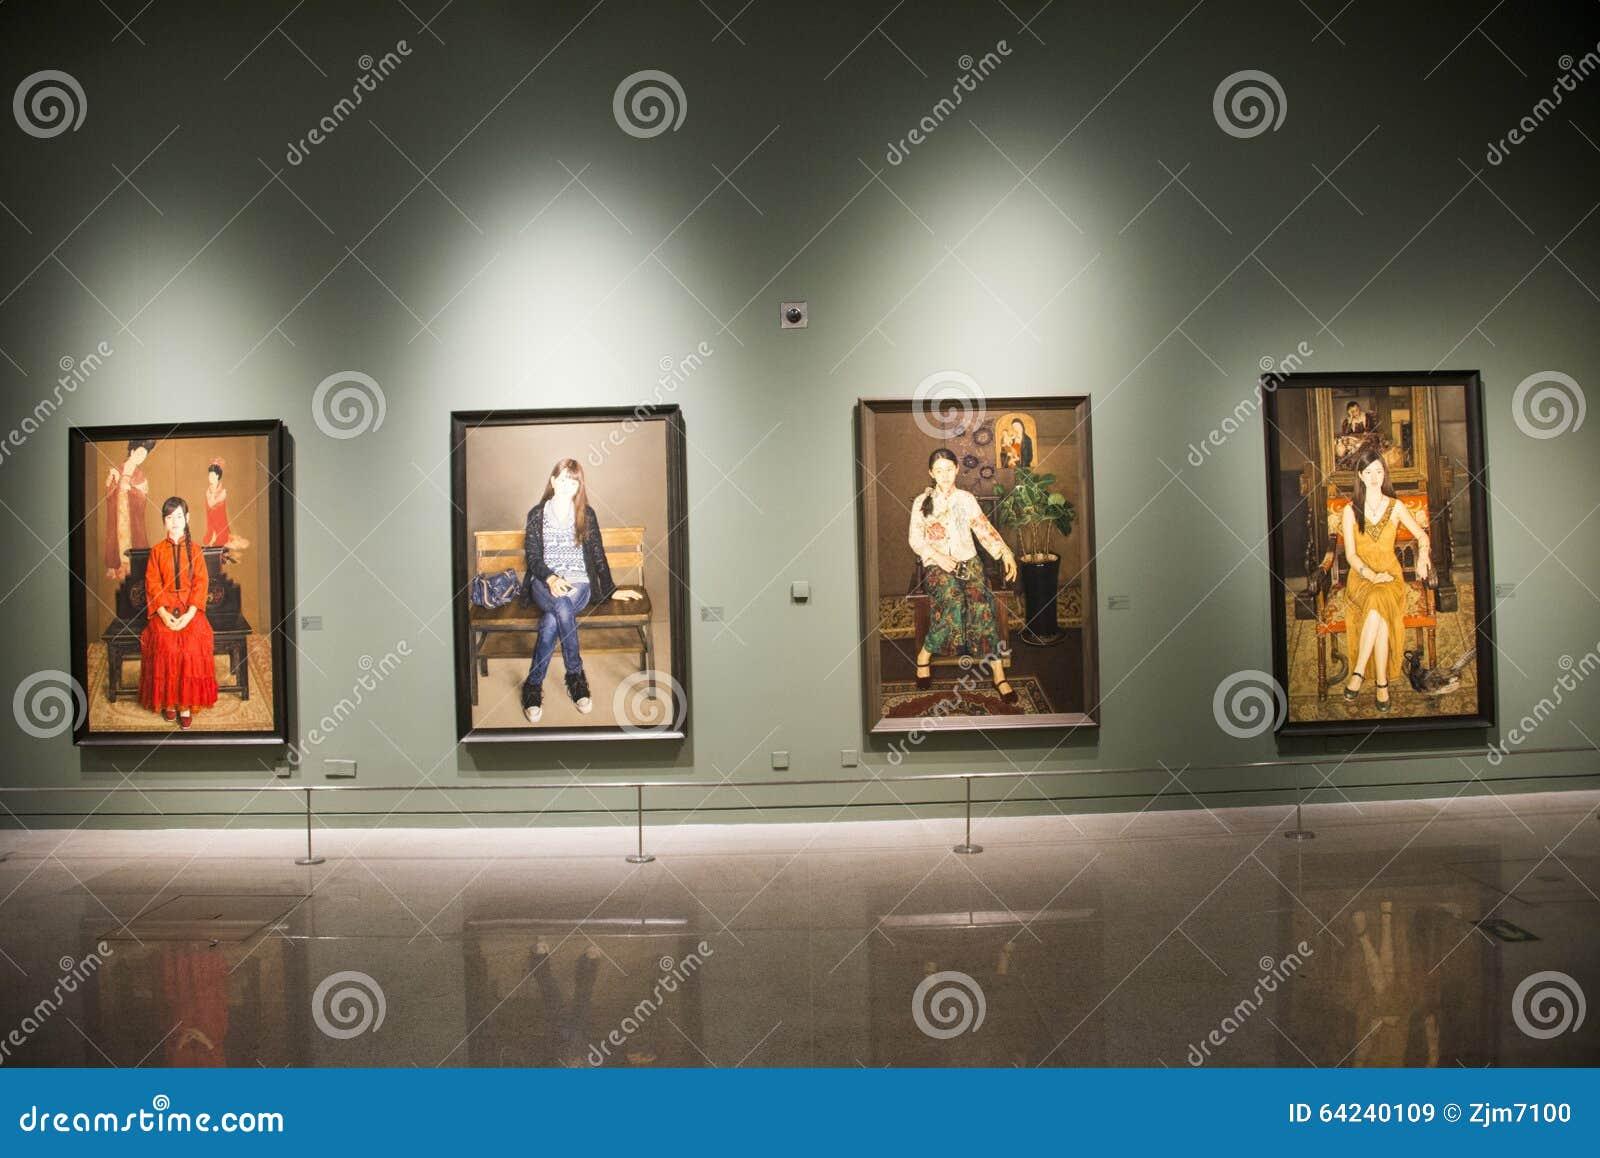 Azië China, Peking, Nationaal Museum, Binnententoonstellingszaal